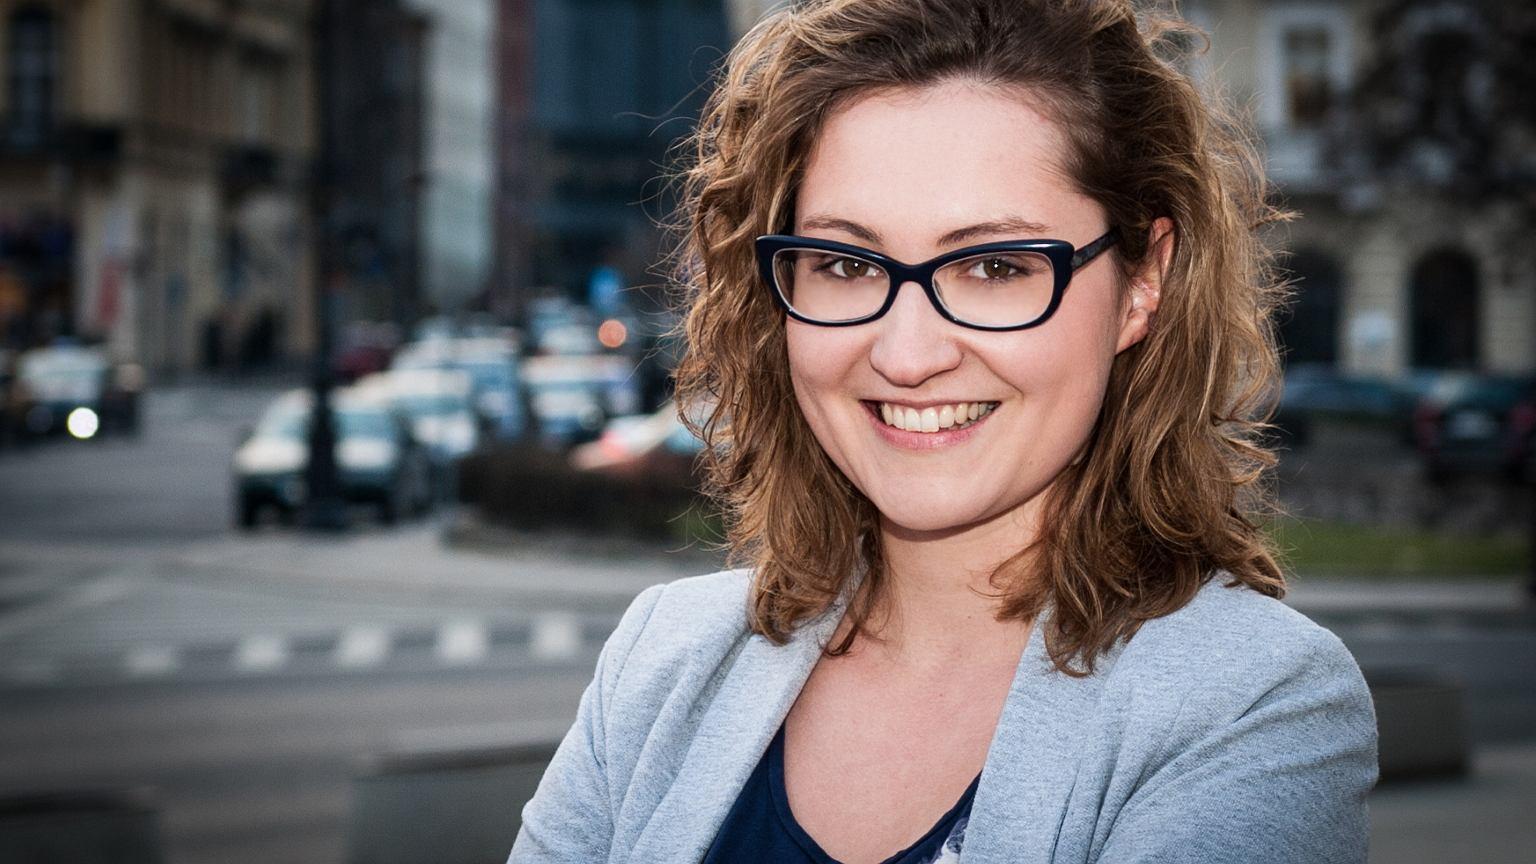 Karolina Przewrocka-Aderet